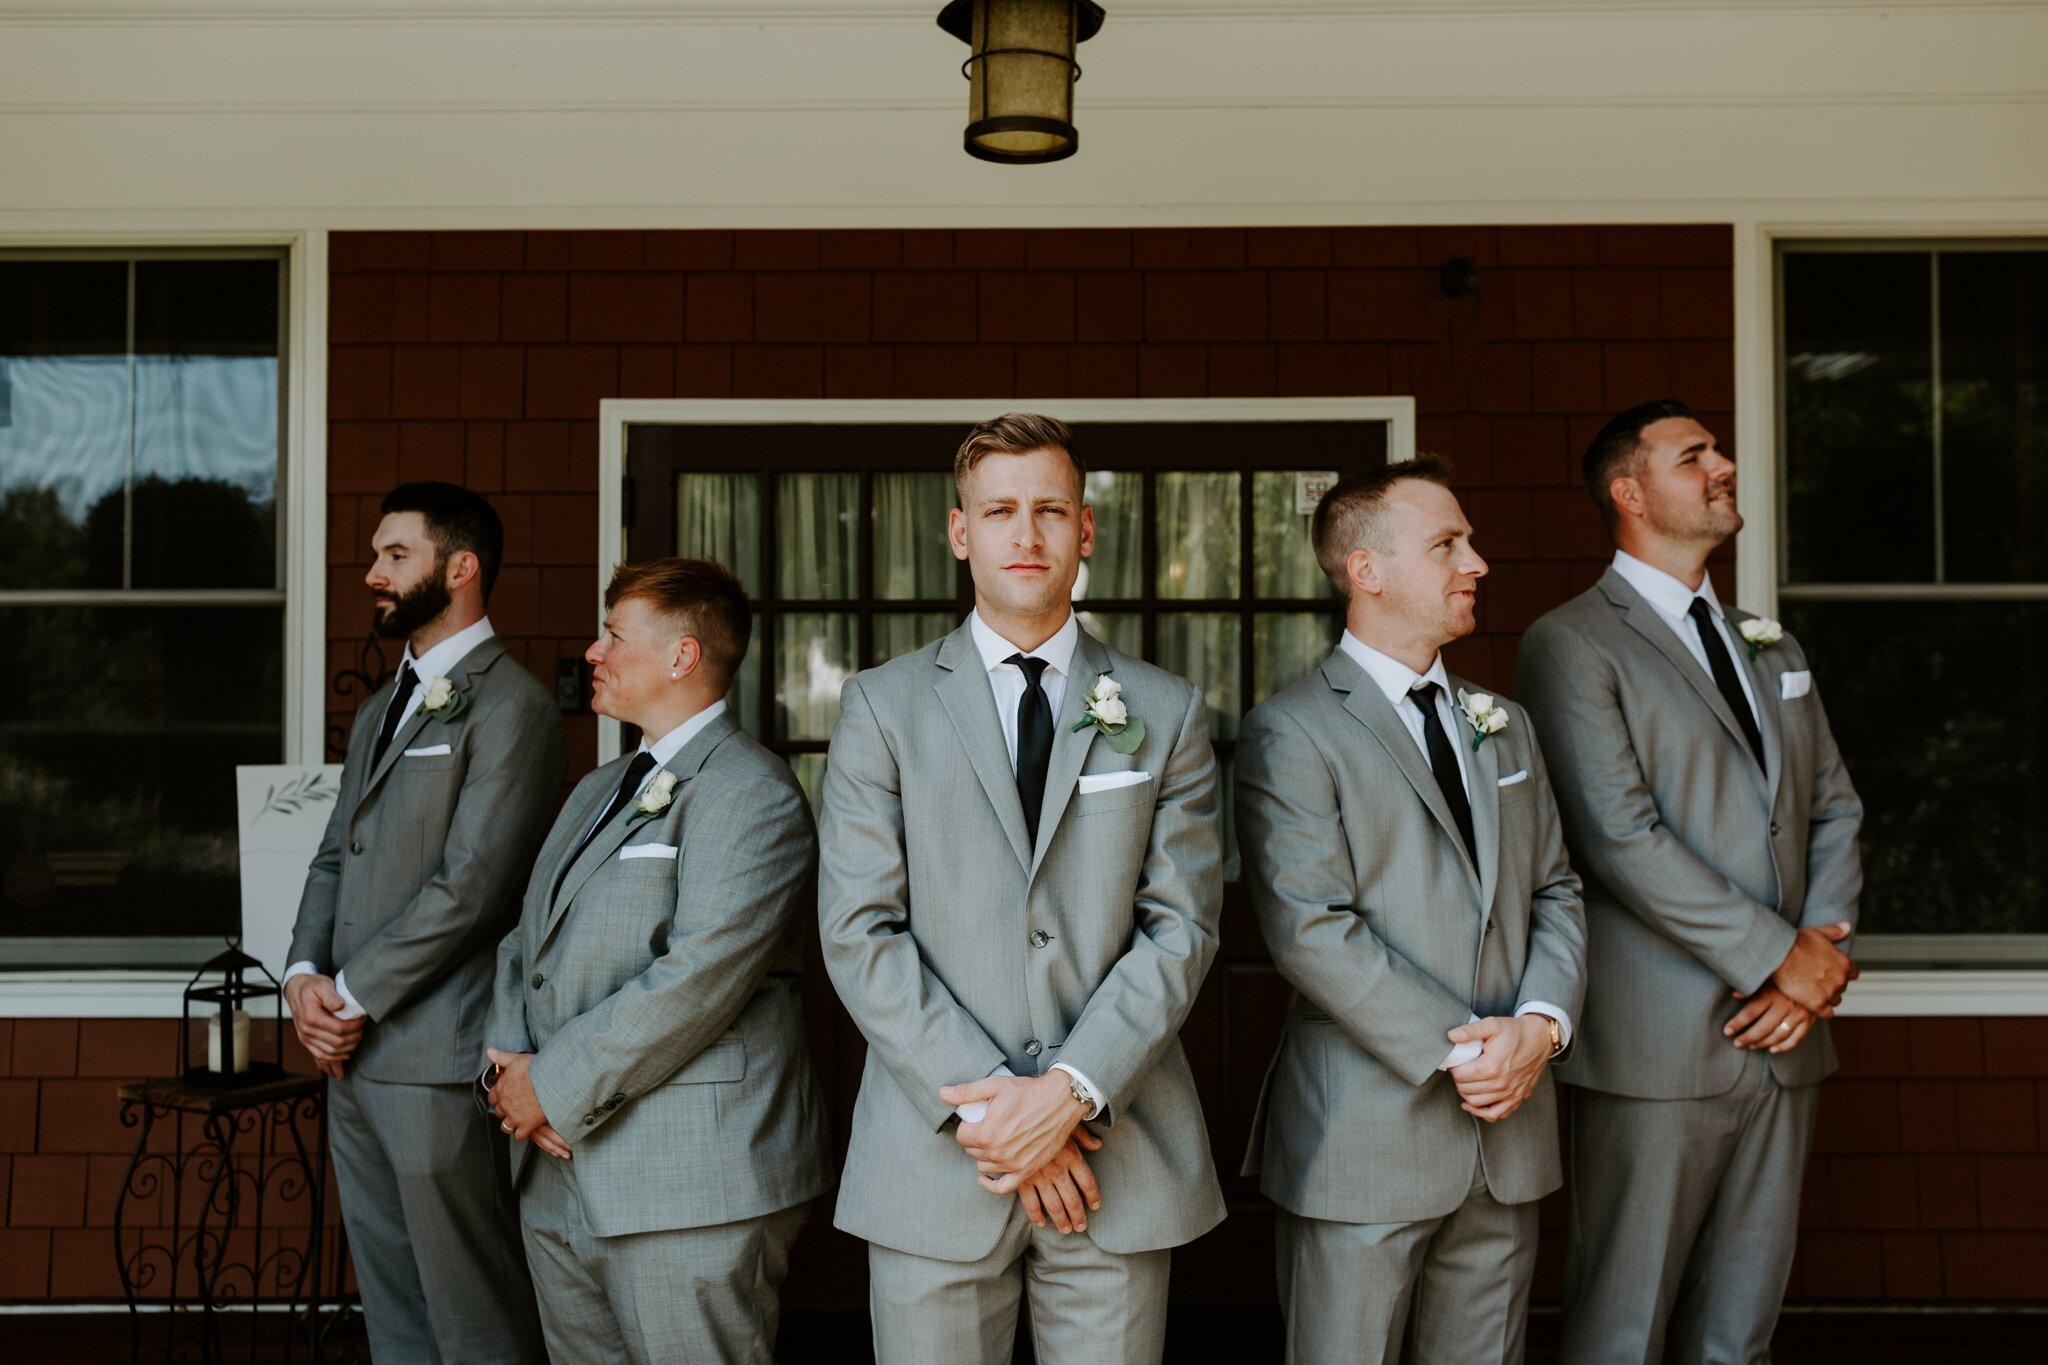 asheville-north-carolina-wedding-photographer_2690.jpg